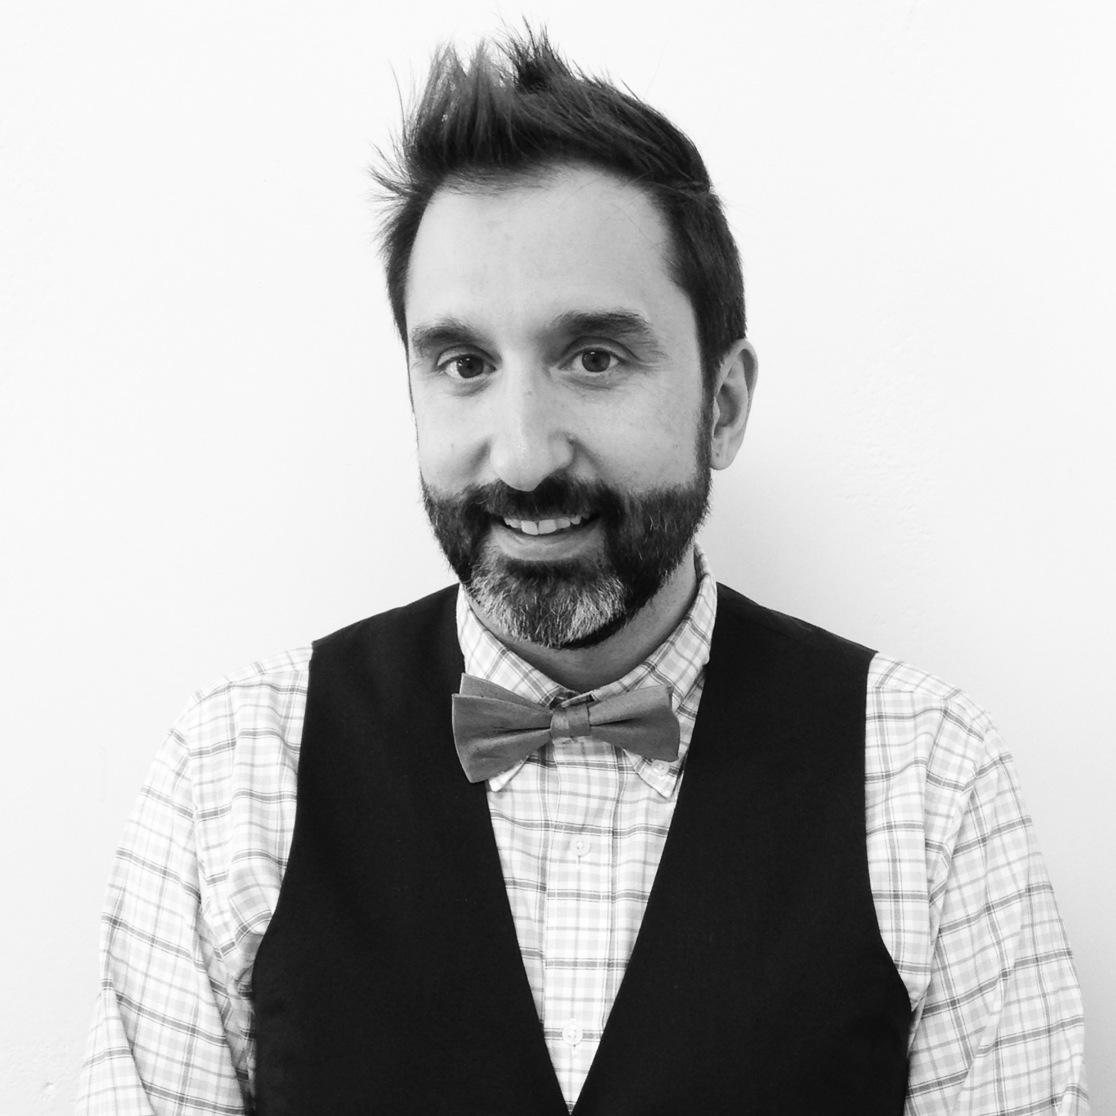 Danny LeClair, co-owner of Studio DNA in Santa Monica, California.